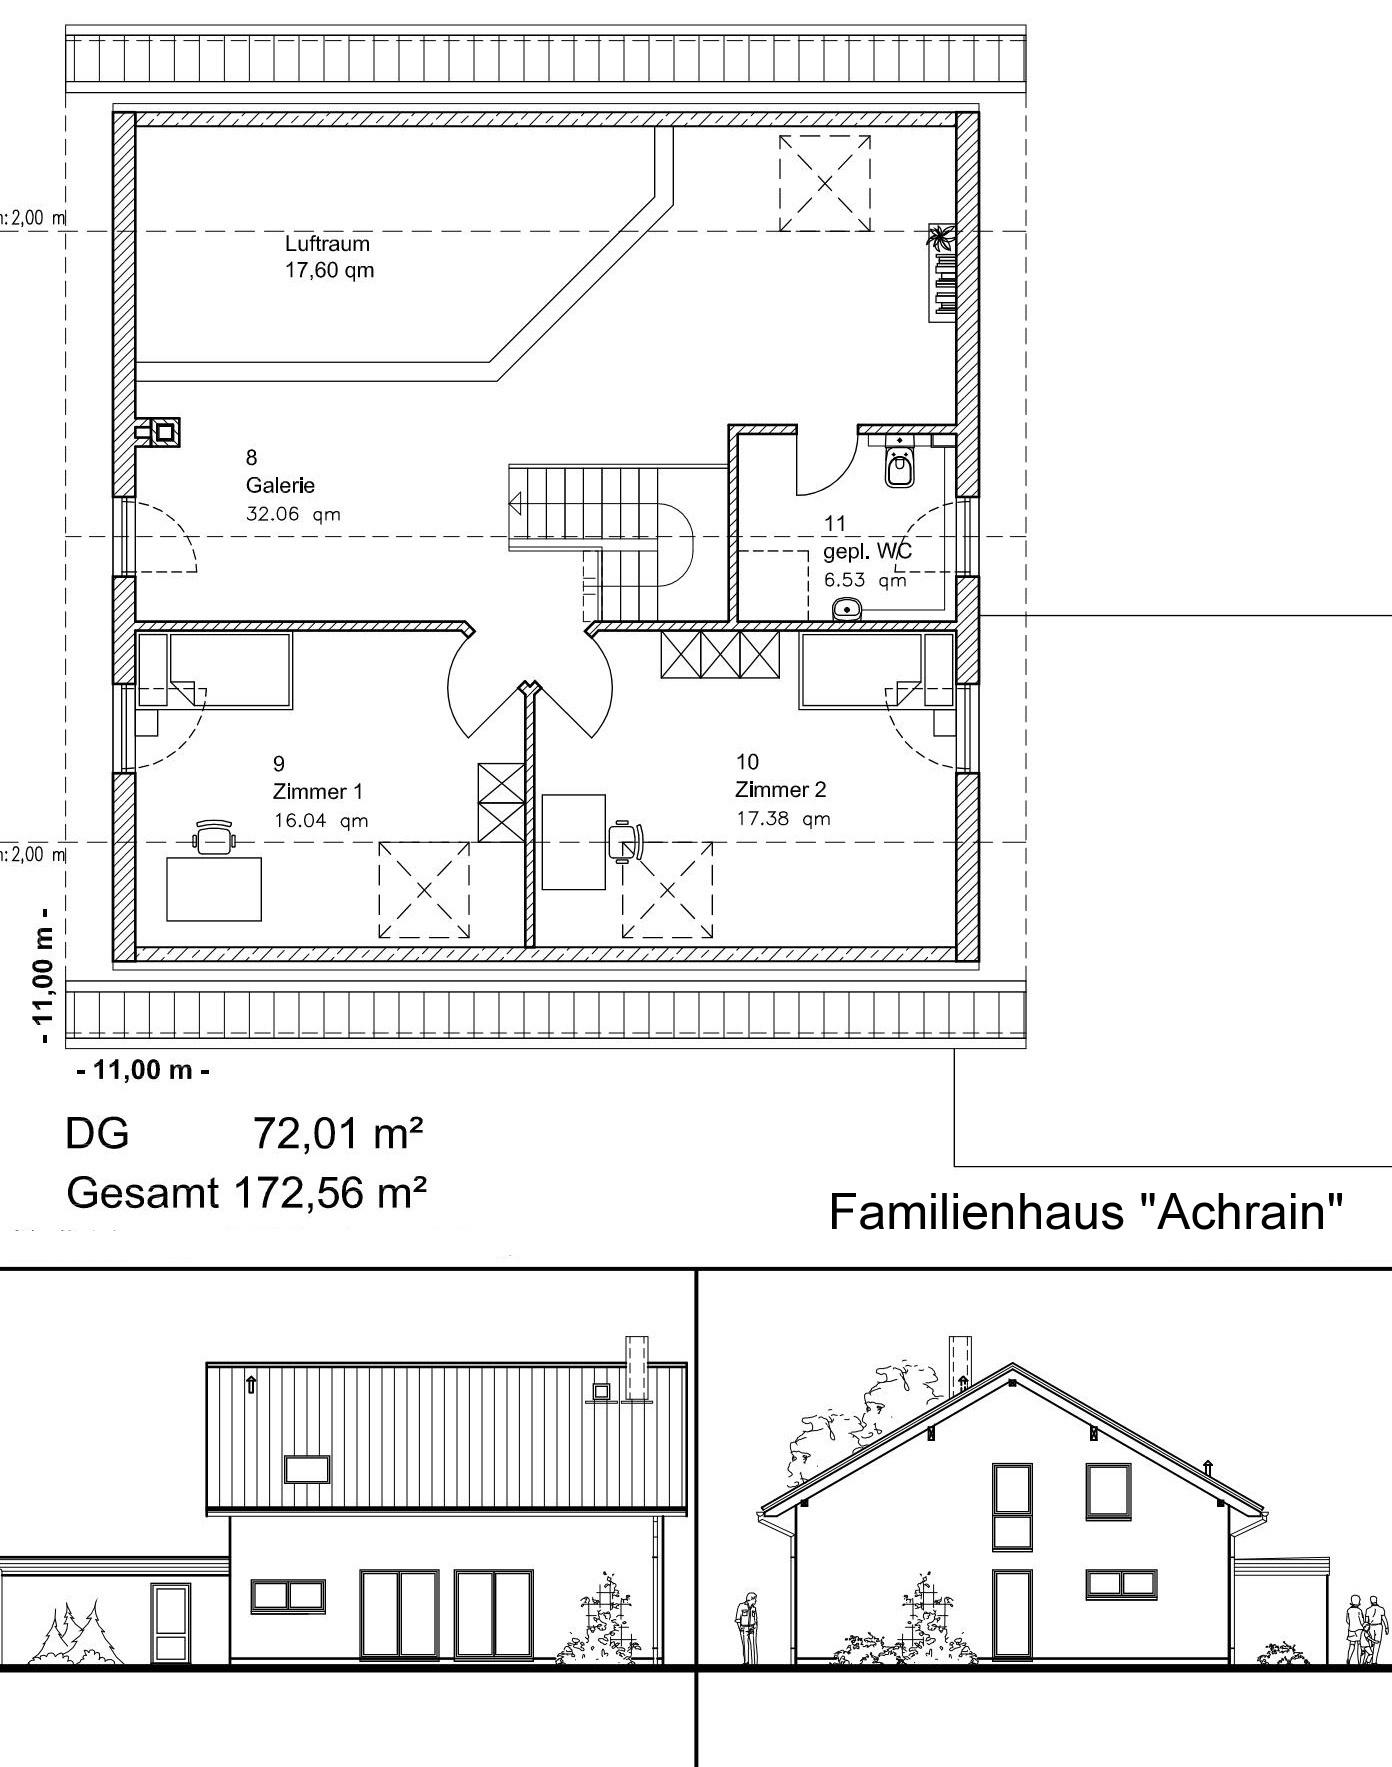 Familienhaus ACHRAIN